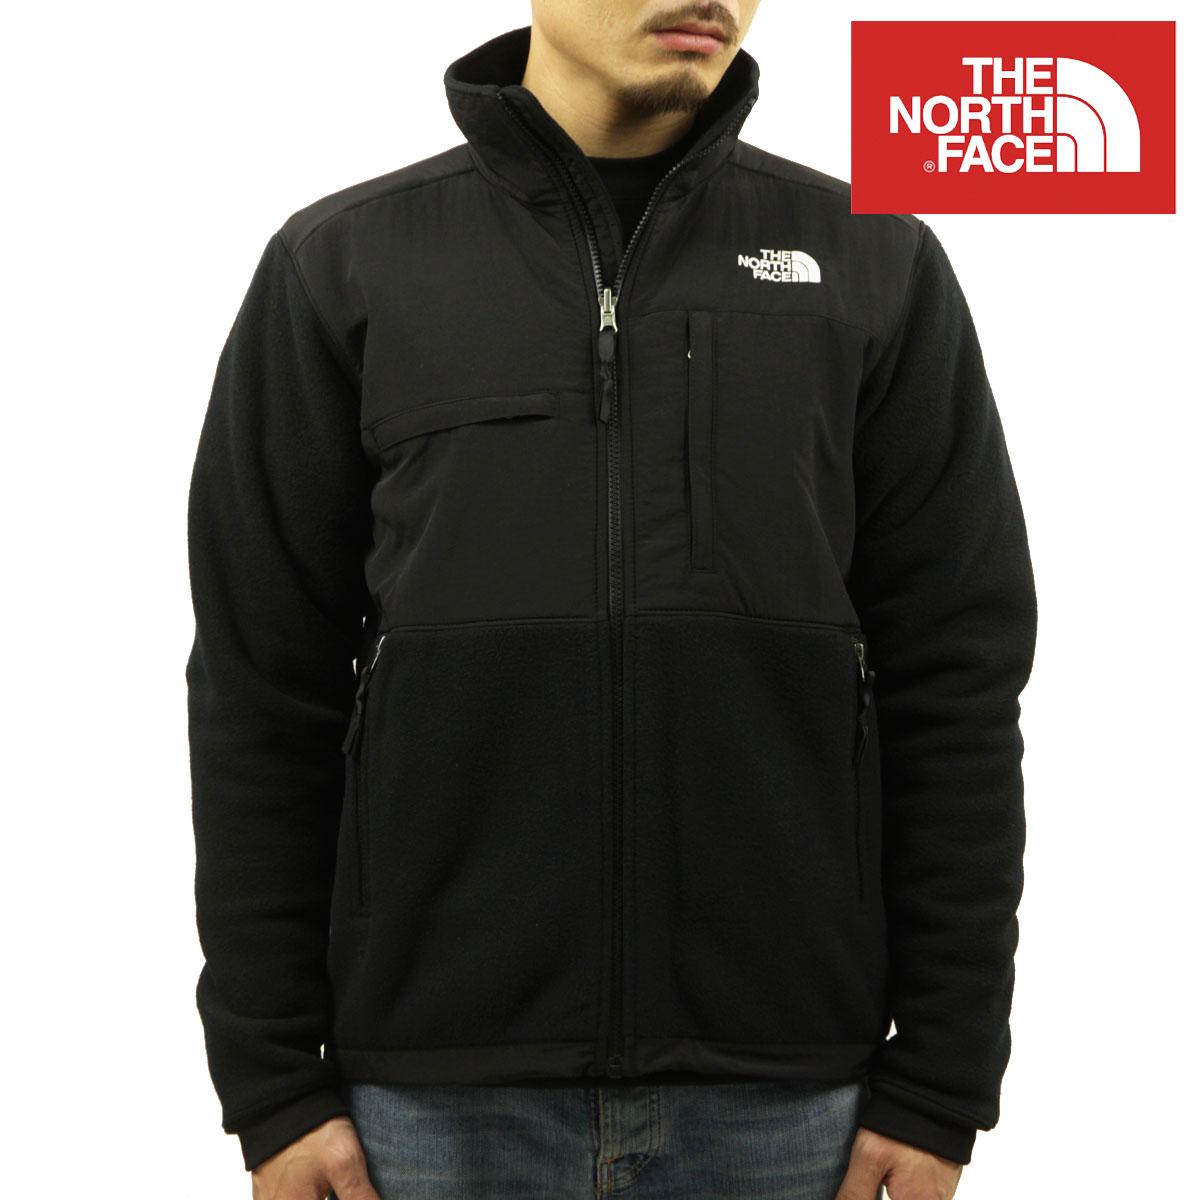 4ee1aff22 North Face THE NORTH FACE regular article men fleece jacket DENALI 2 FLEECE  JACKET RECYCLED TNF BLACK NF0A2RDK LE4